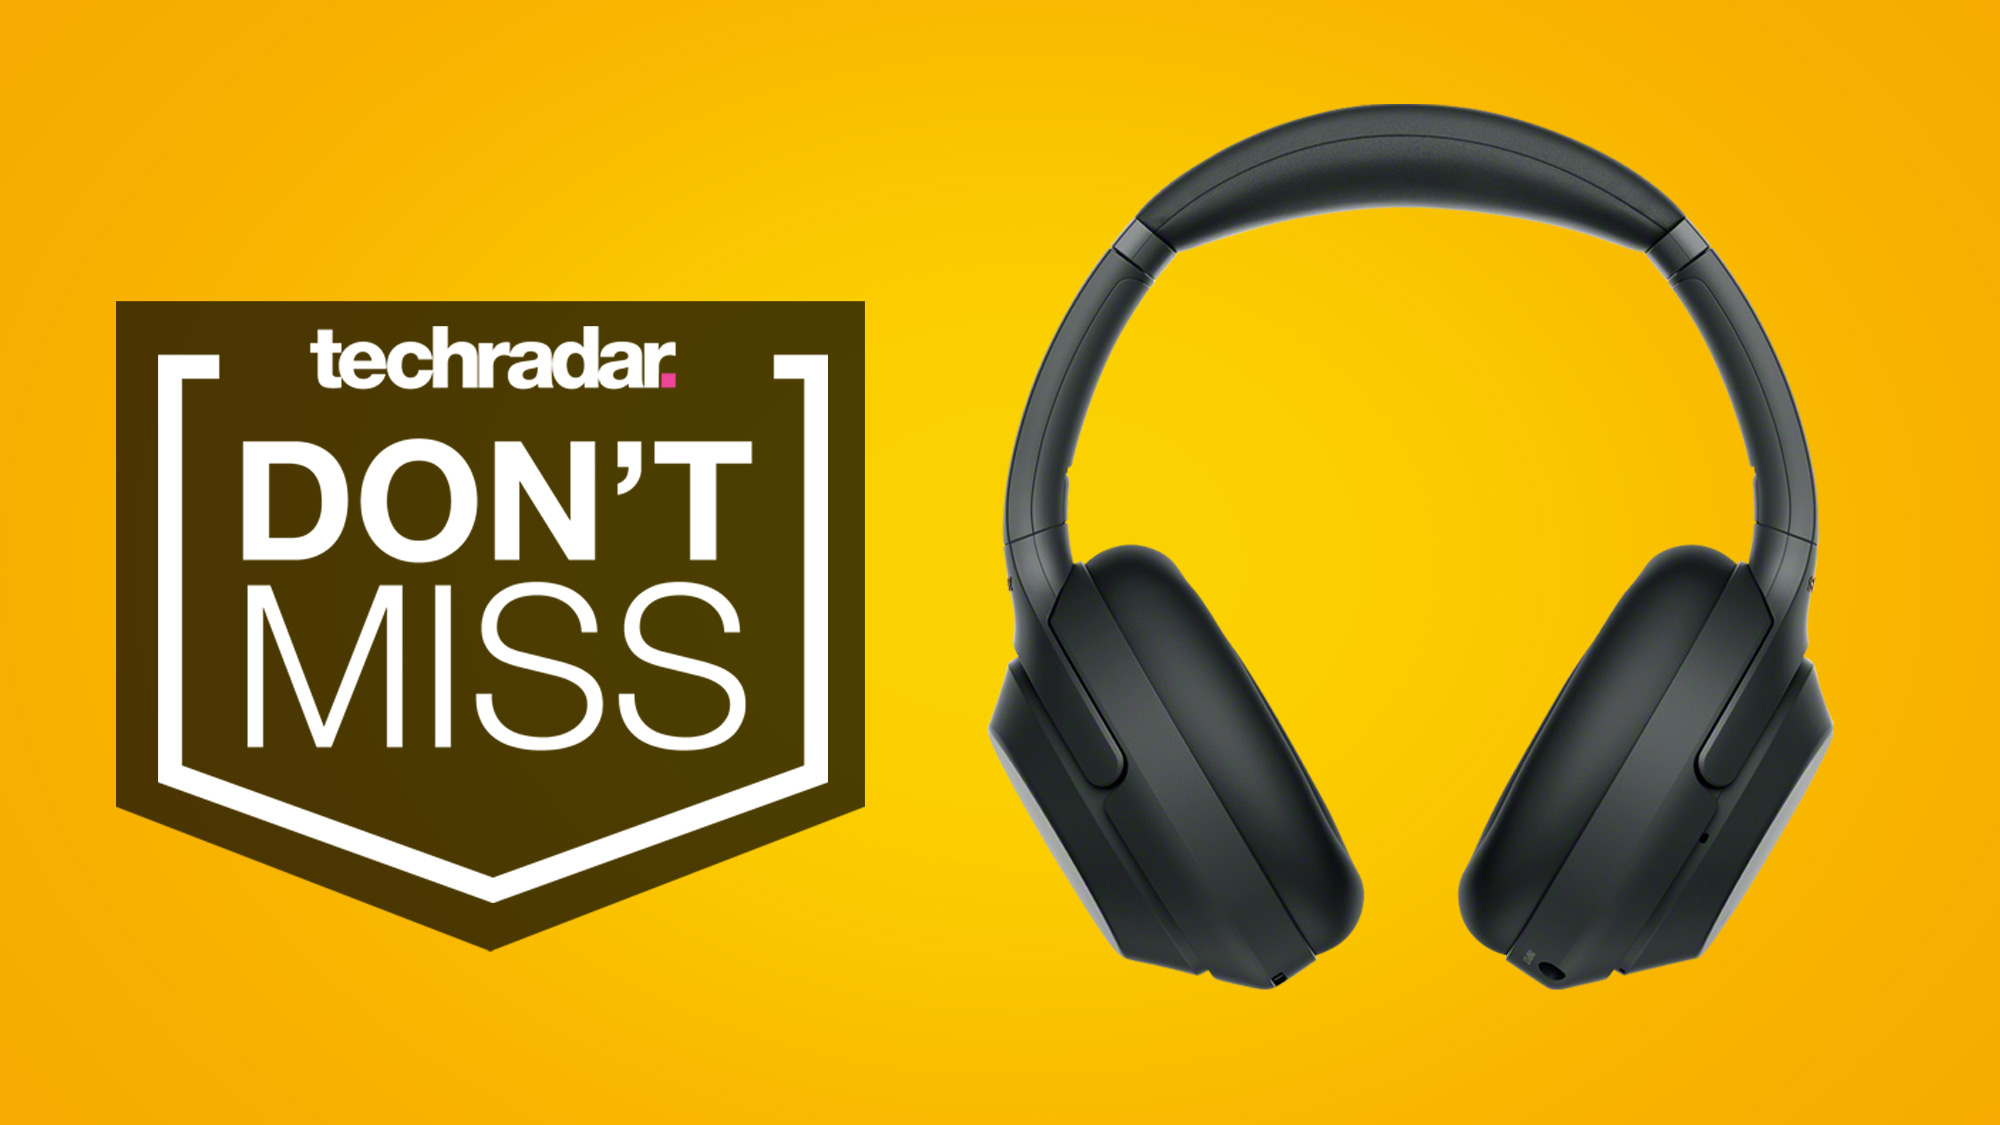 Amazing Sony WH-1000XM3 noise-canceling headphones hit lowest price ever